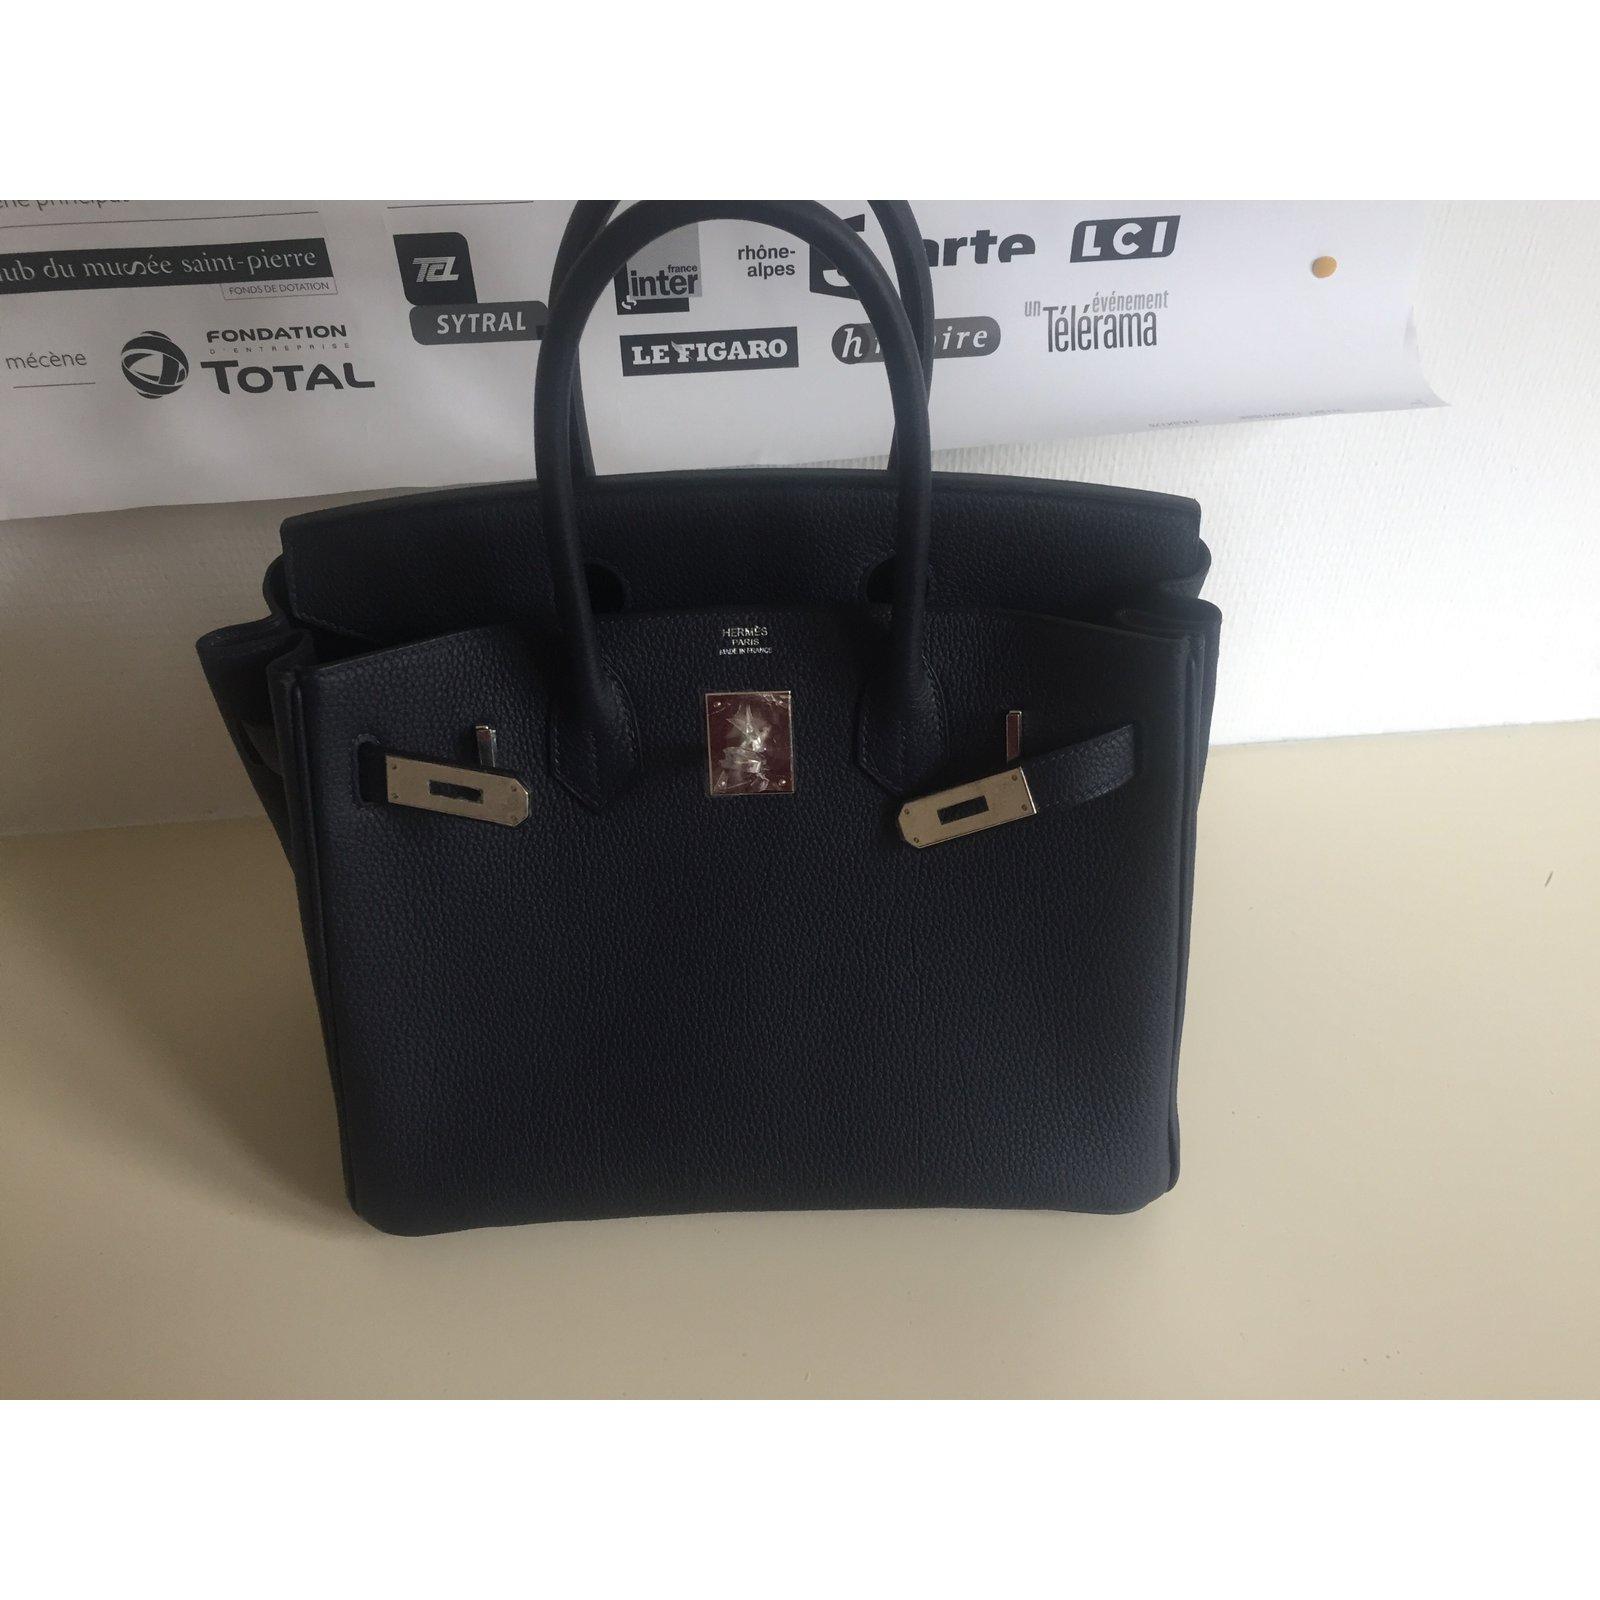 ebc8dd4c2aa ... coupon code for hermès birkin 30 handbags leather navy blue ref.47483 joli  closet a41b5